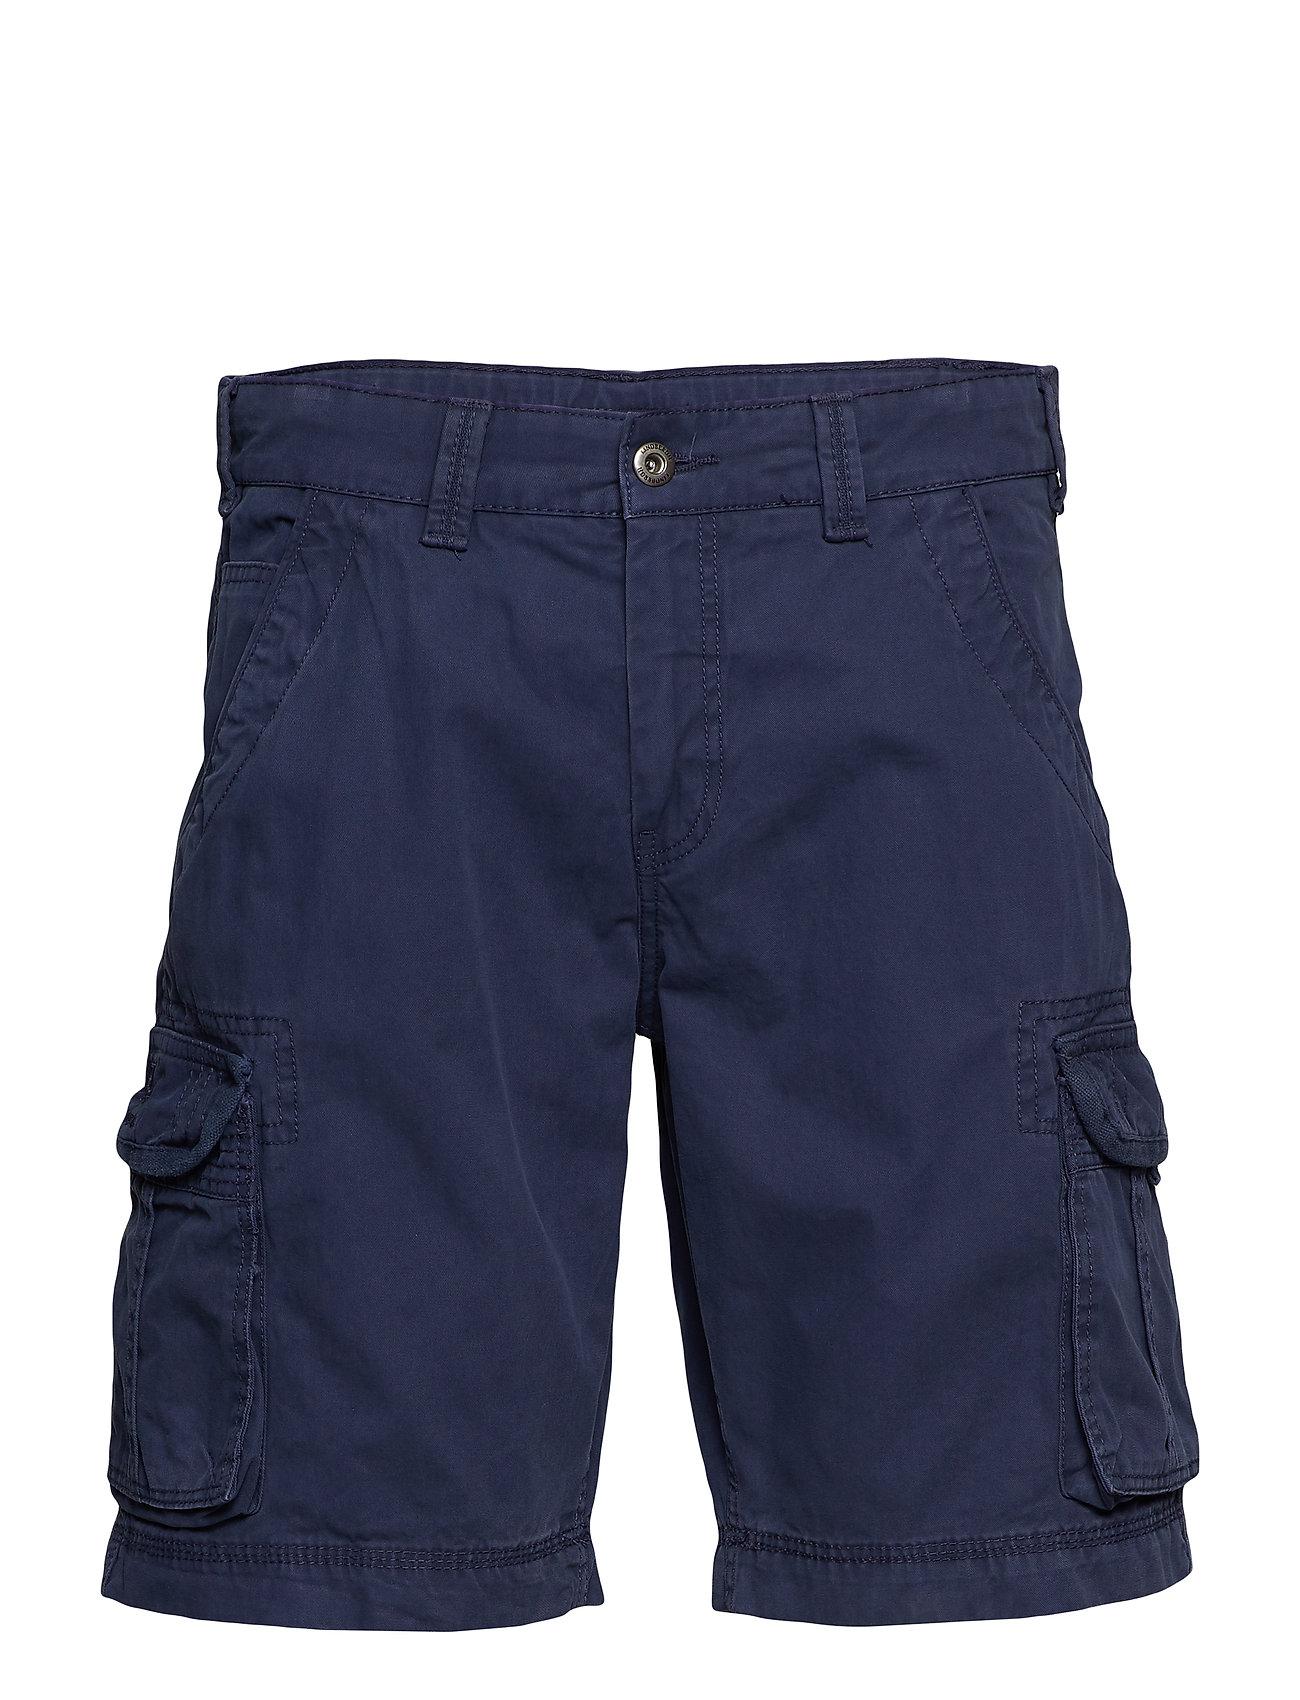 Lindbergh Cargo shorts - DK BLUE